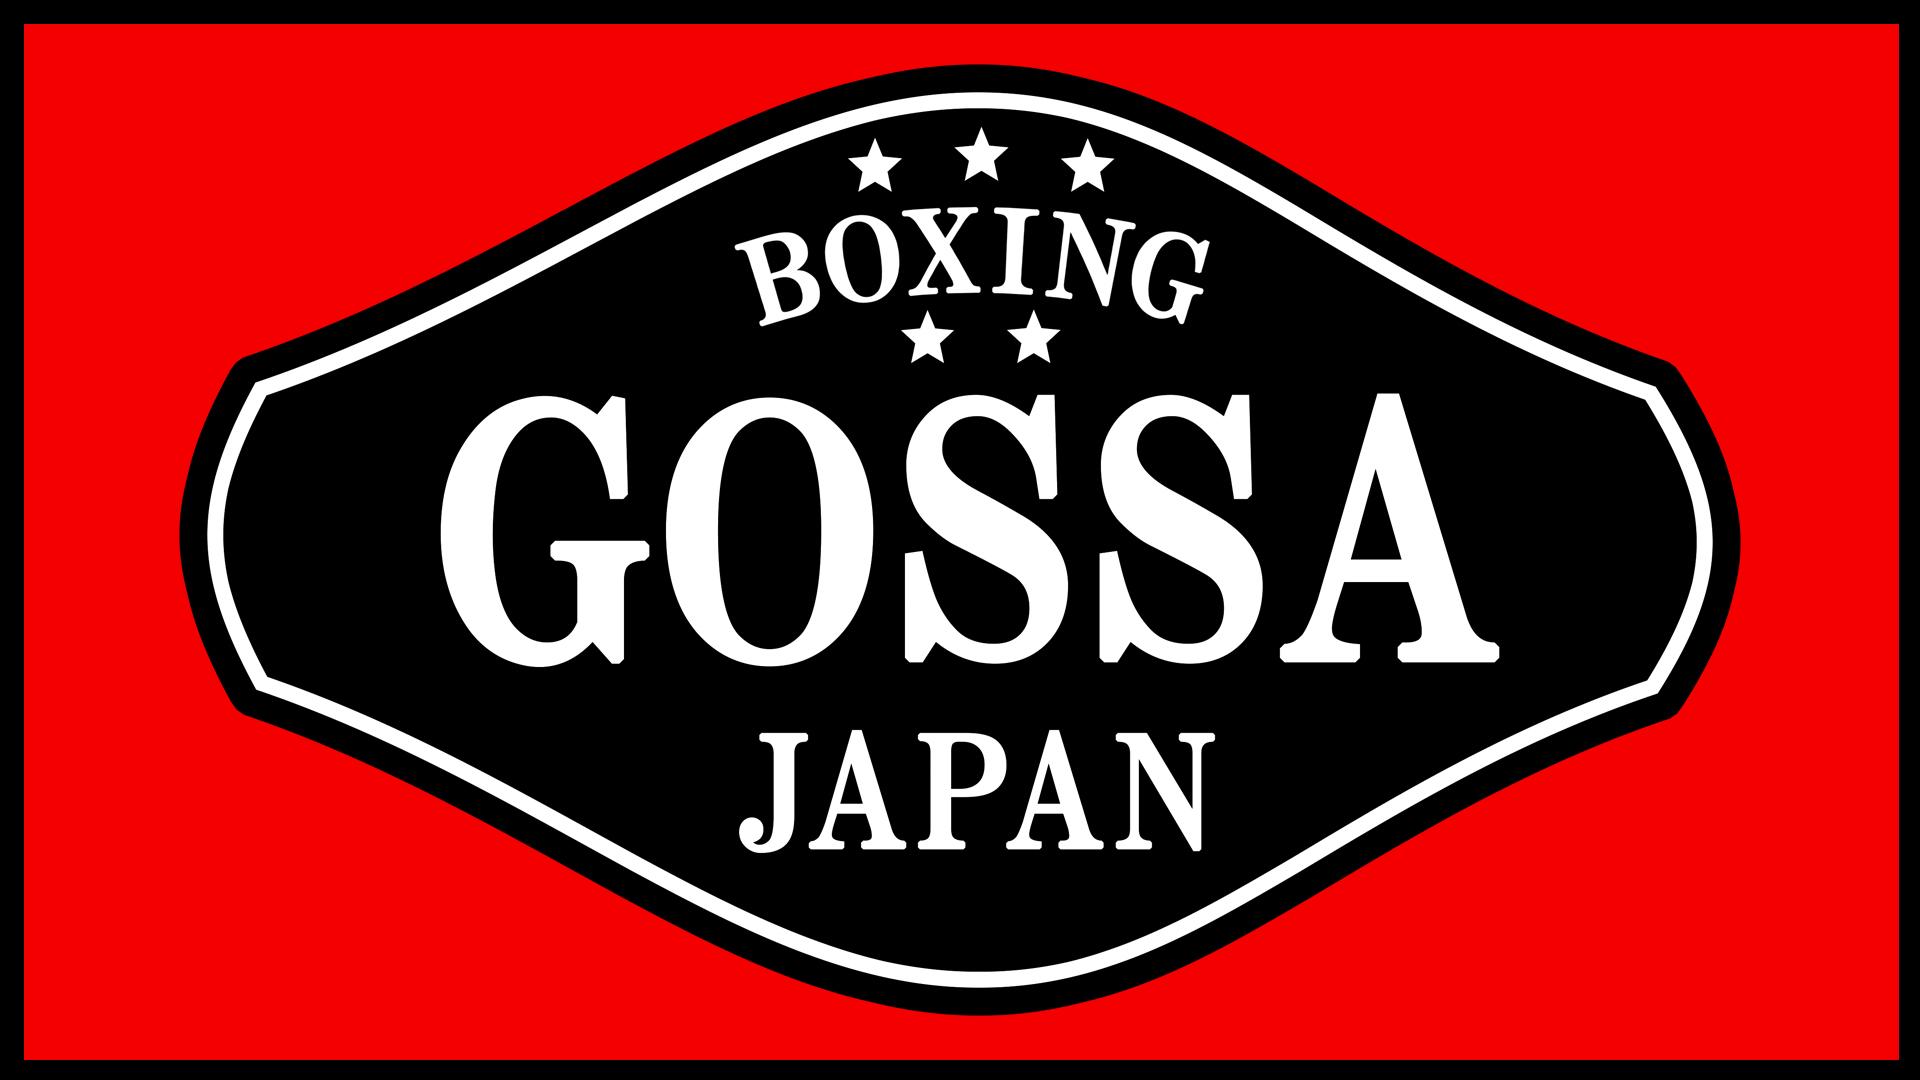 GOSSA(ゴッサ)Boxing goods store